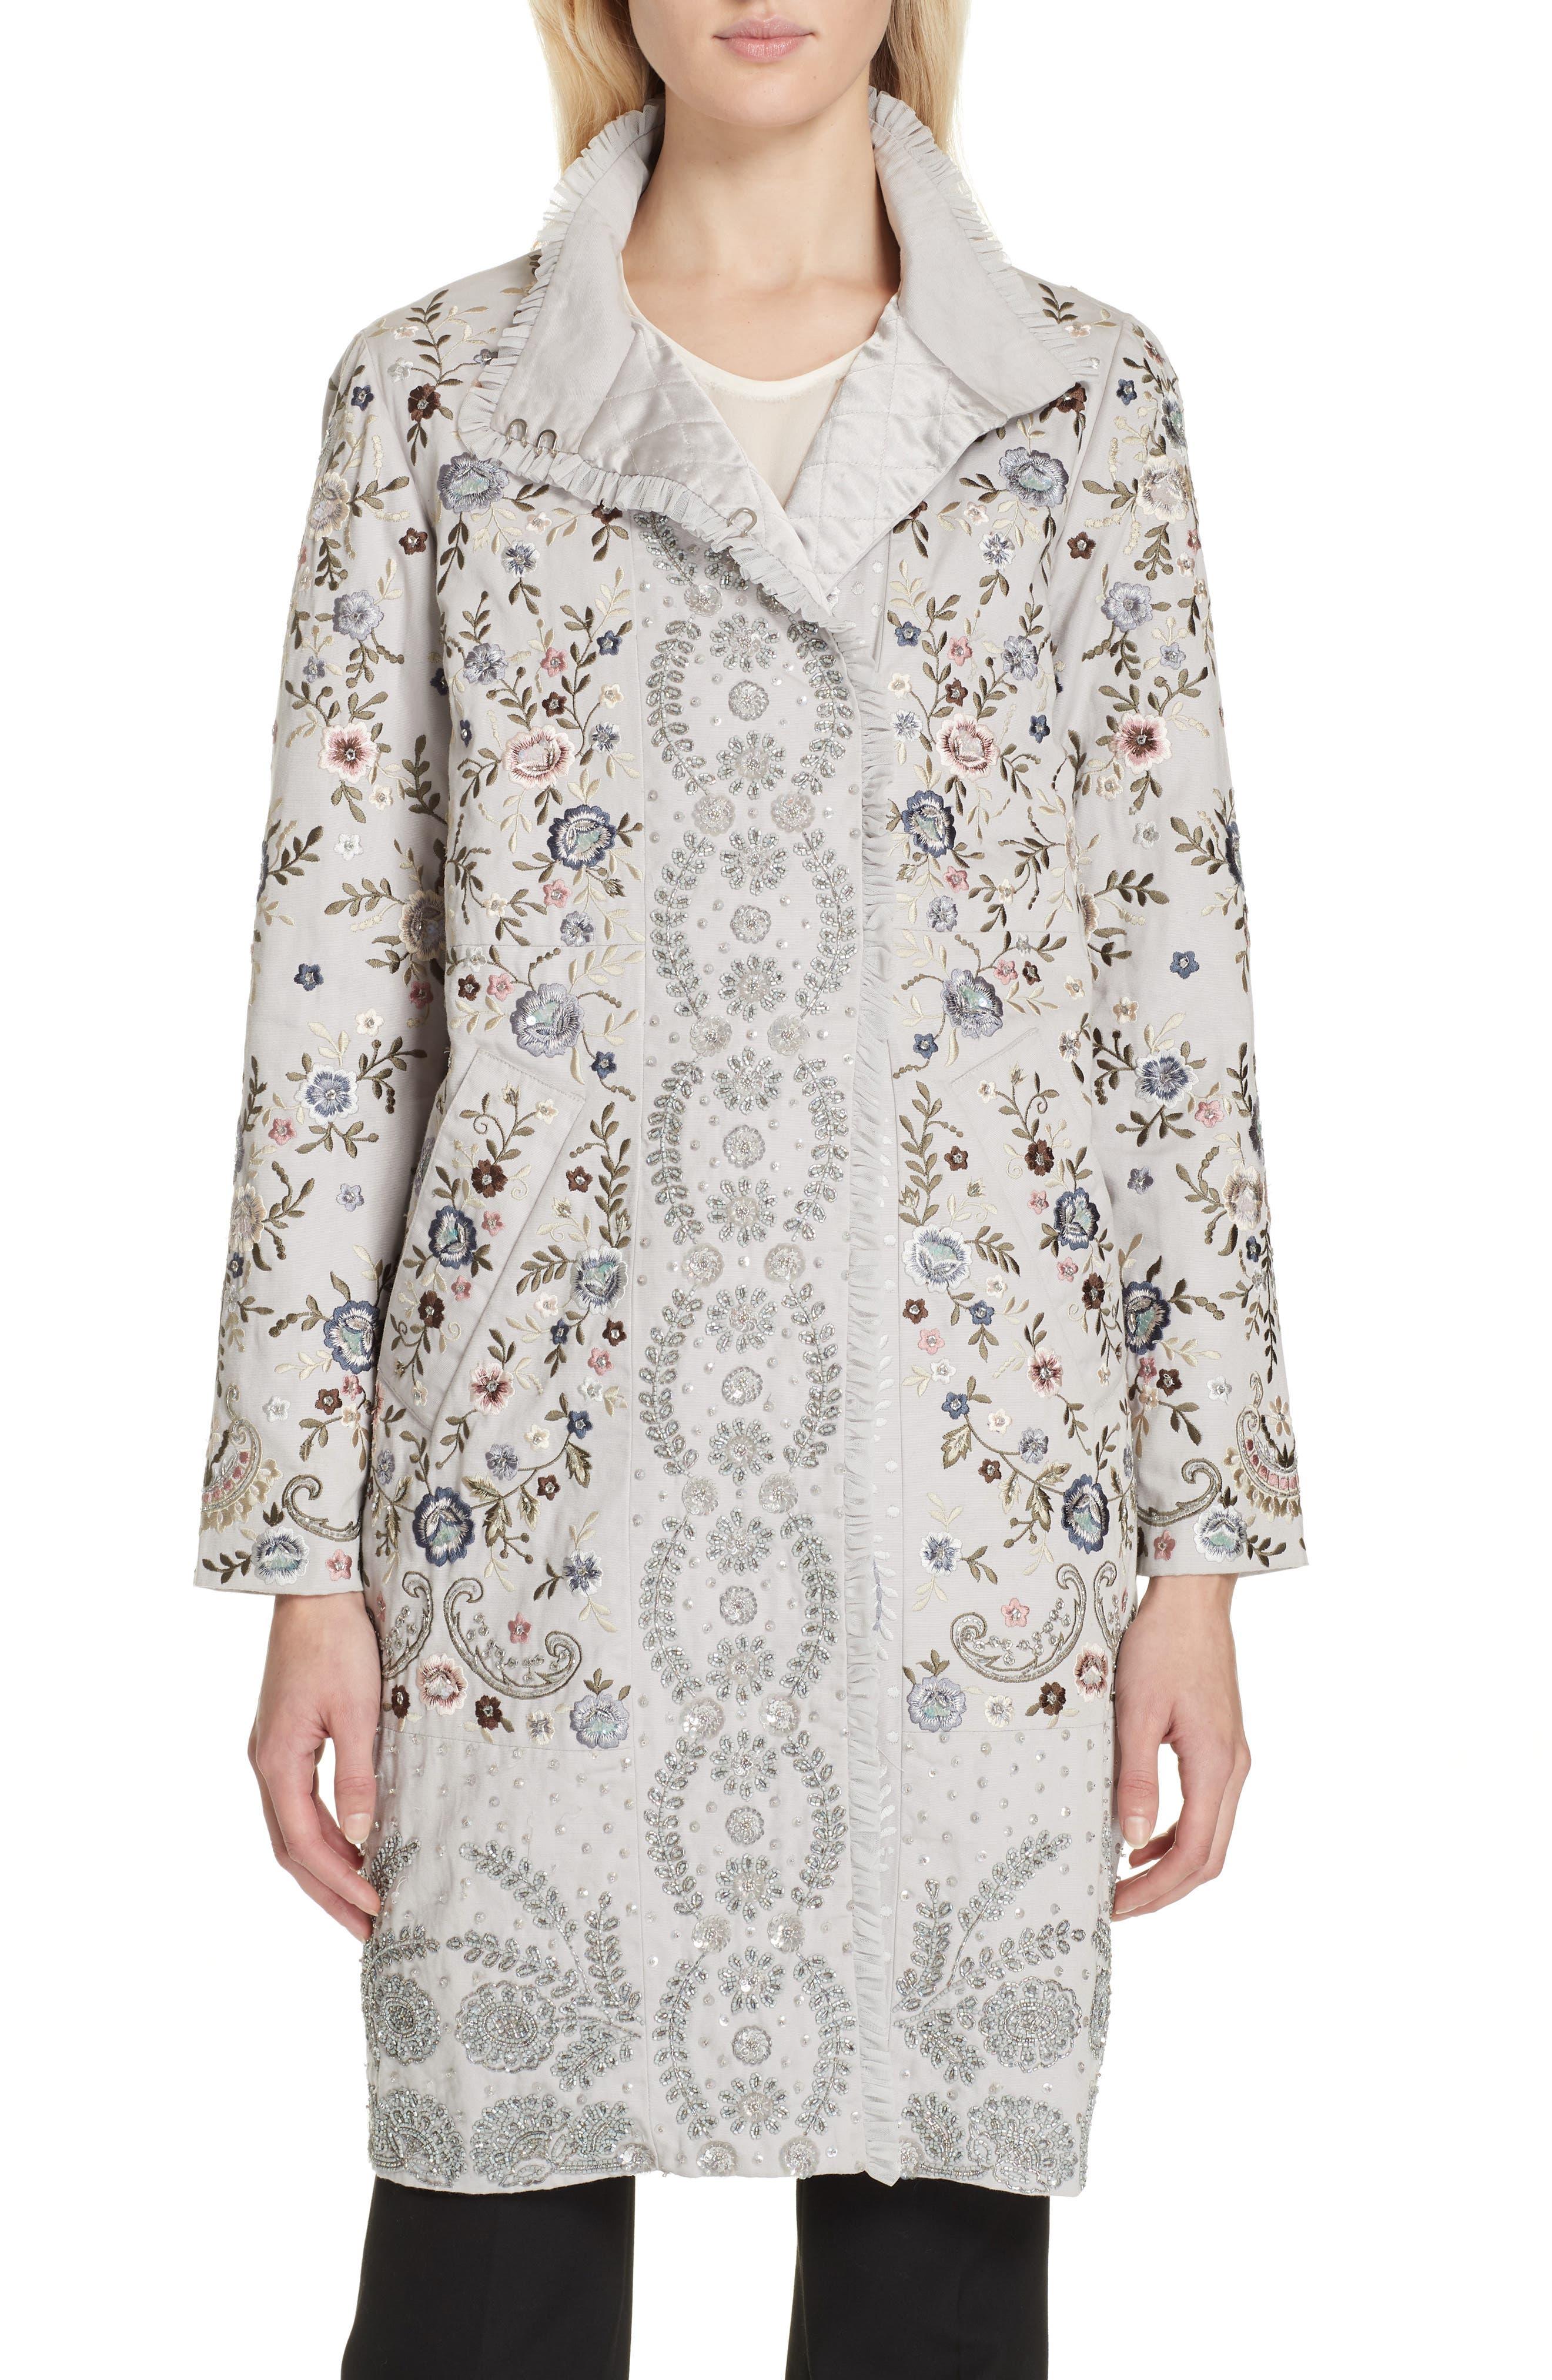 Vintage Coats & Jackets | Retro Coats and Jackets Womens Needle  Thread Ella Embellished Coat Size 6 - Blue $688.00 AT vintagedancer.com